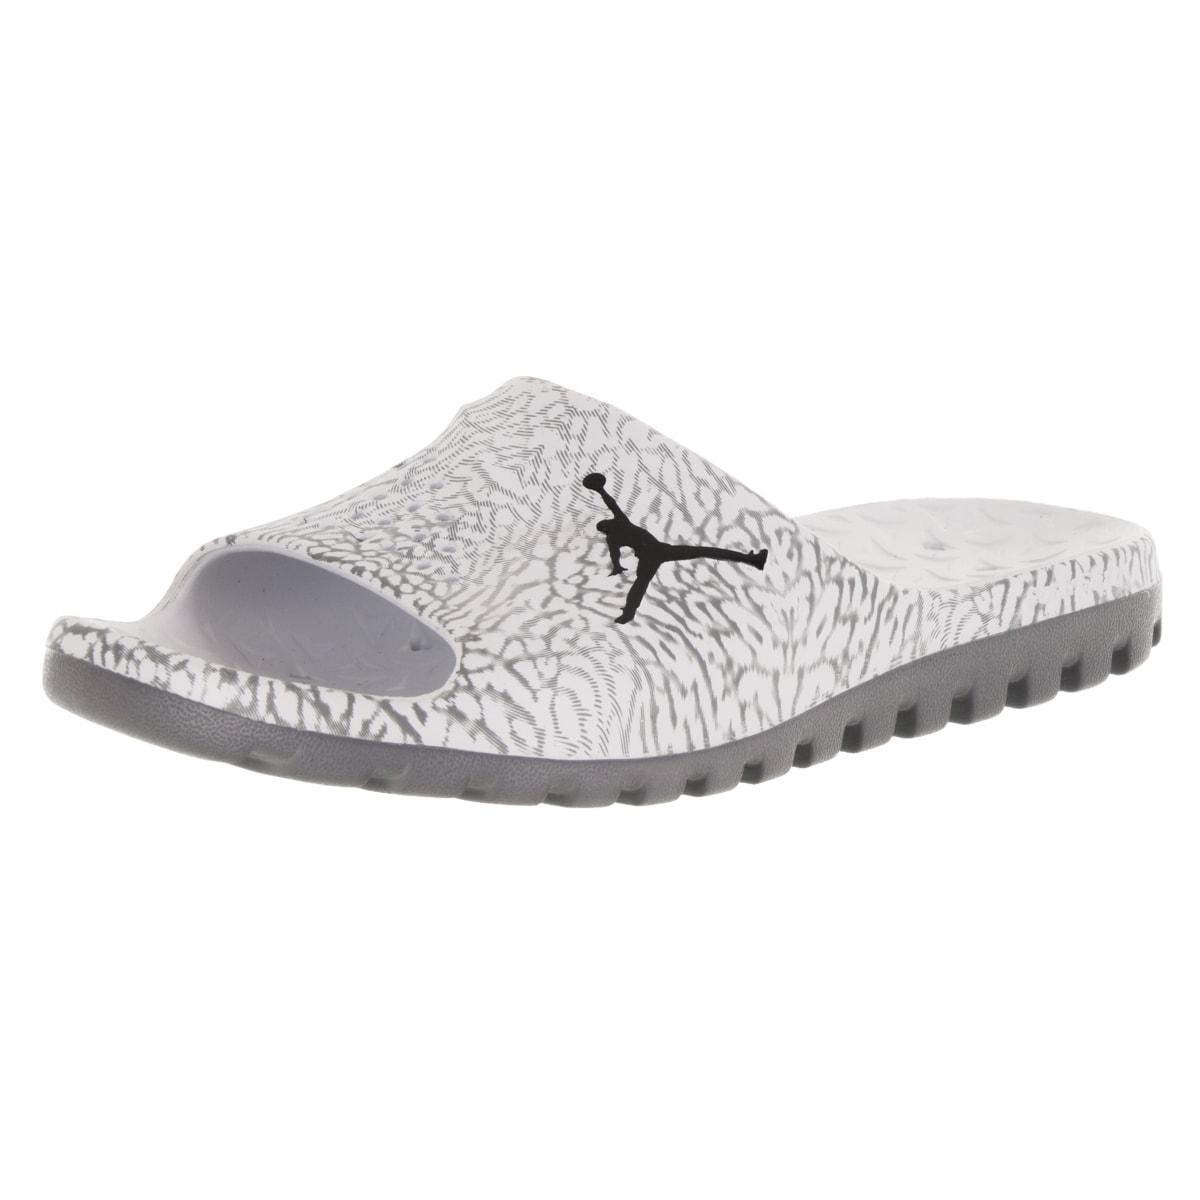 74be0fd52b0f5c Shop Nike Jordan Men s Jordan Super.Fly Team Slide Pure Platinum Black Cool  Grey Sandal - Free Shipping On Orders Over  45 - Overstock - 12318157